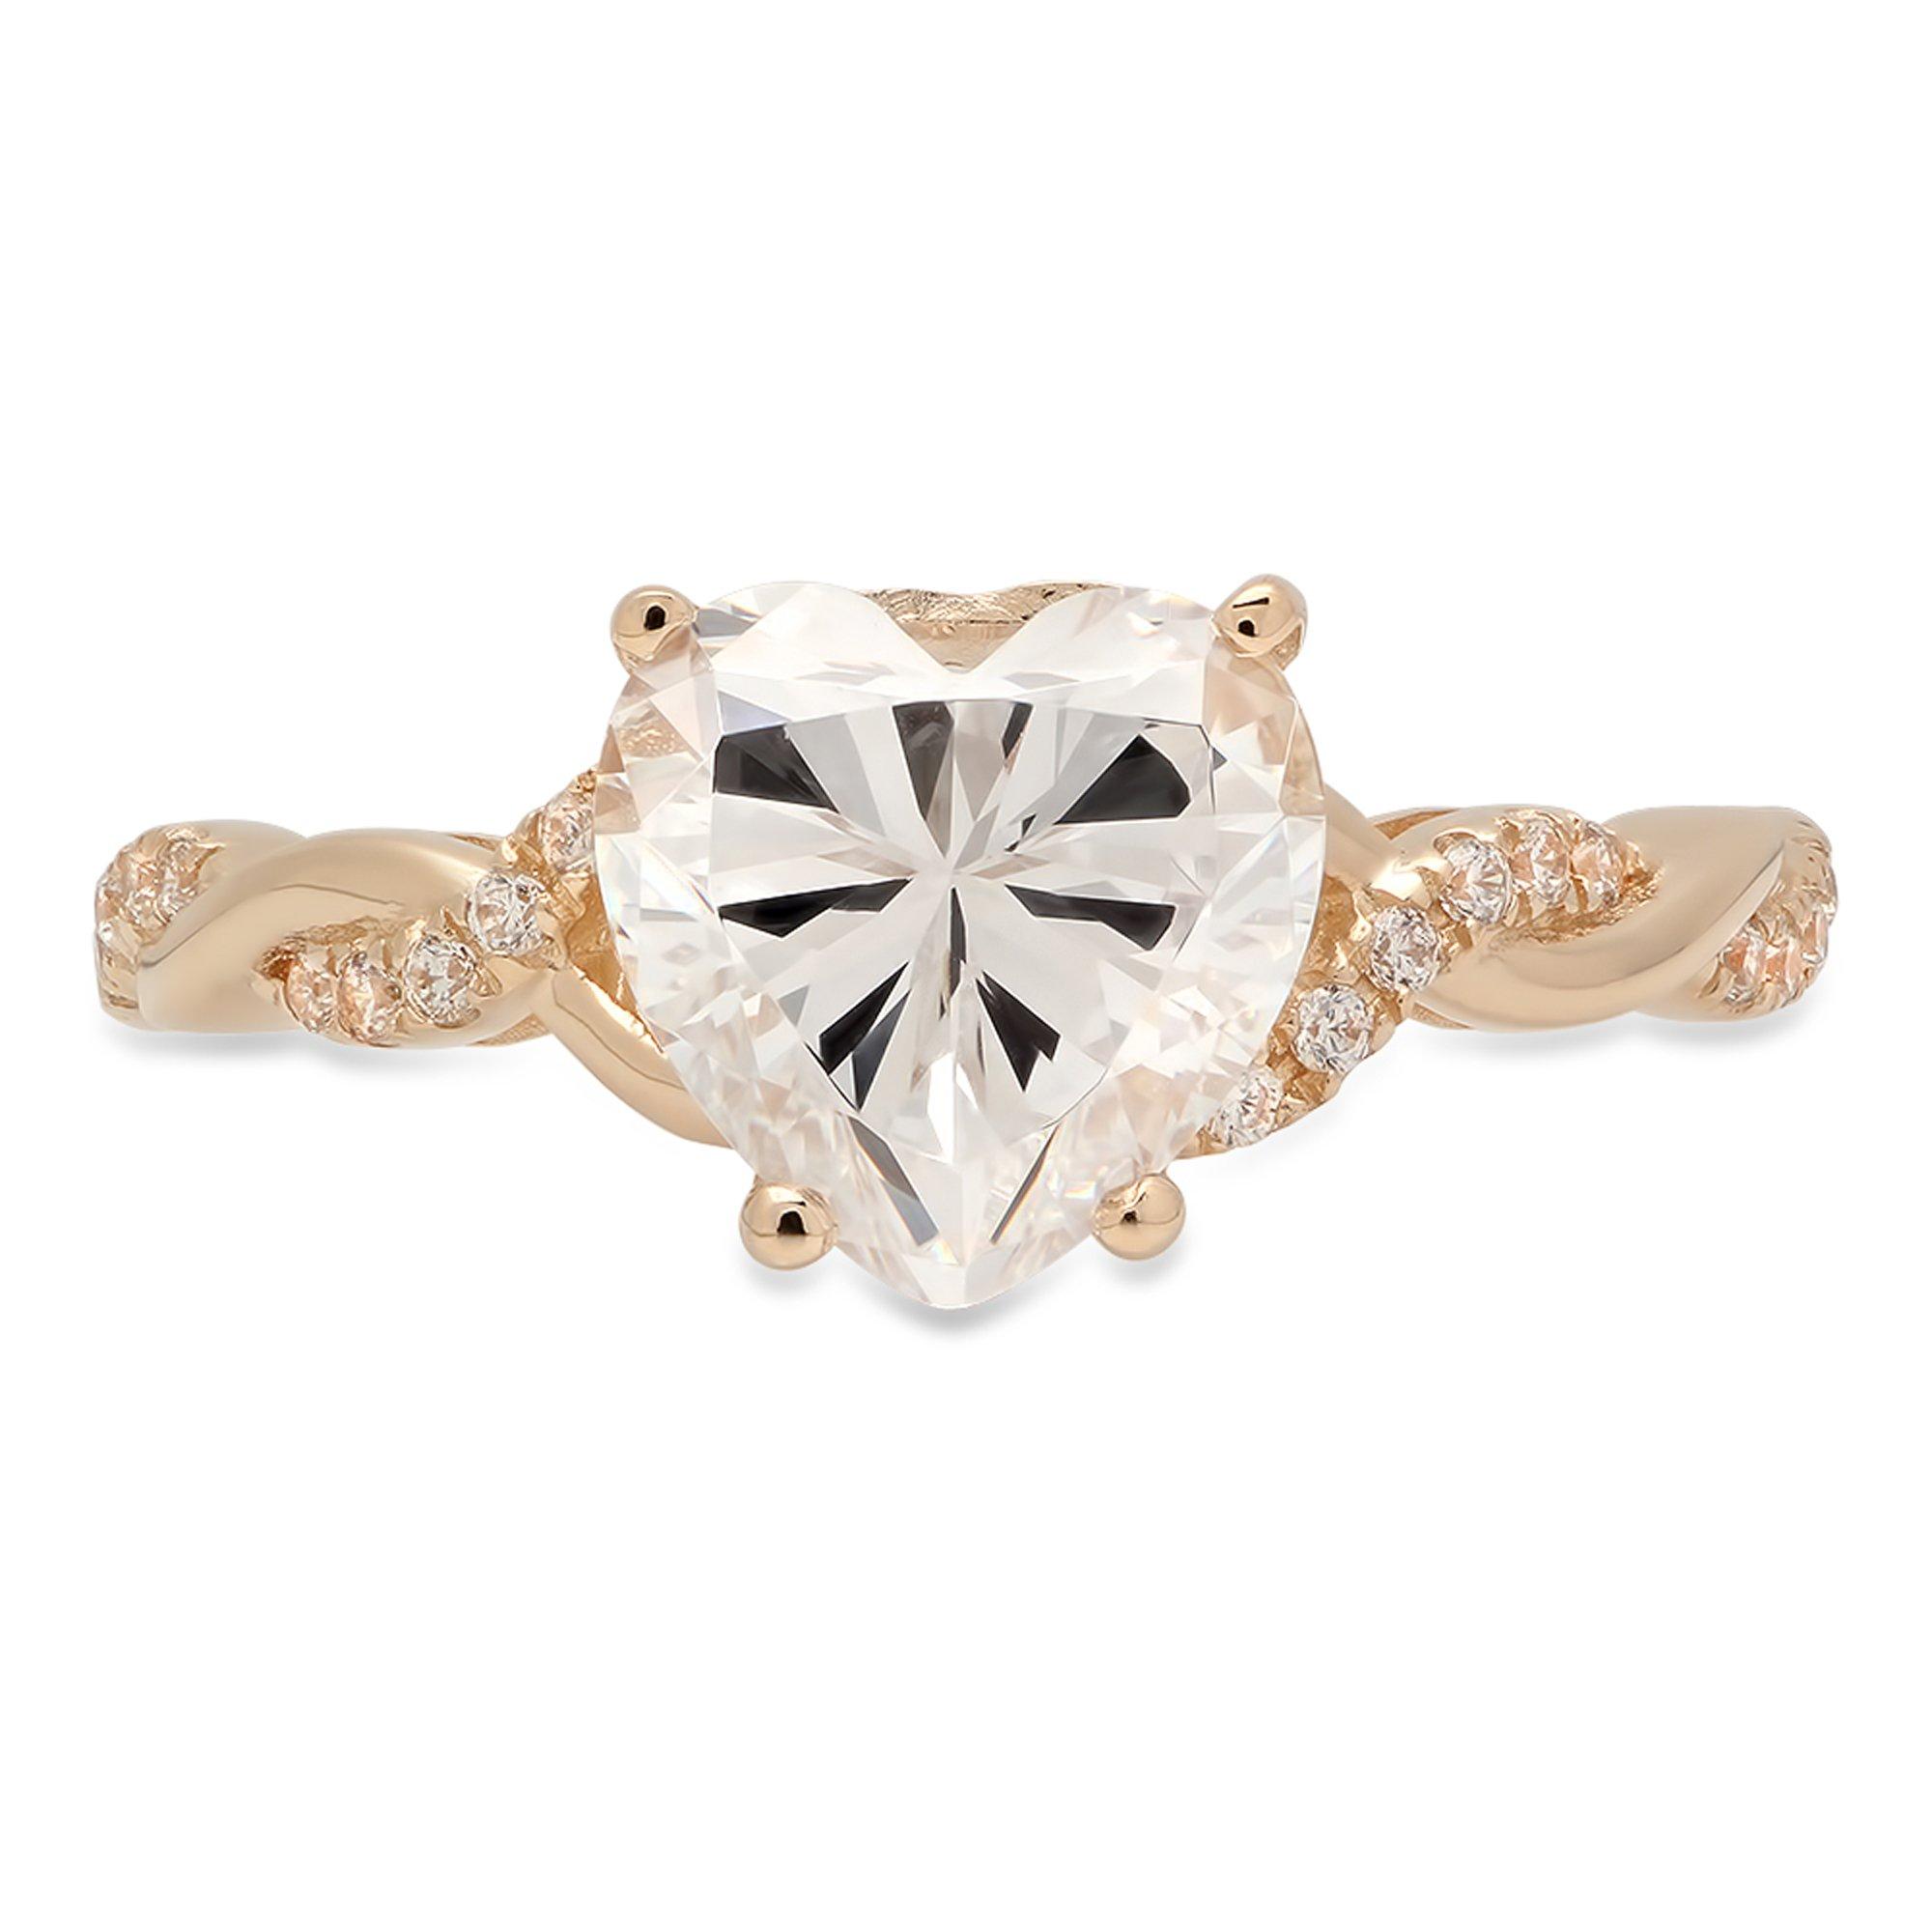 Clara Pucci 2.29 CT Heart Brilliant Cut CZ Designer Criss Cross Twisted Ring Band 14k Yellow Gold